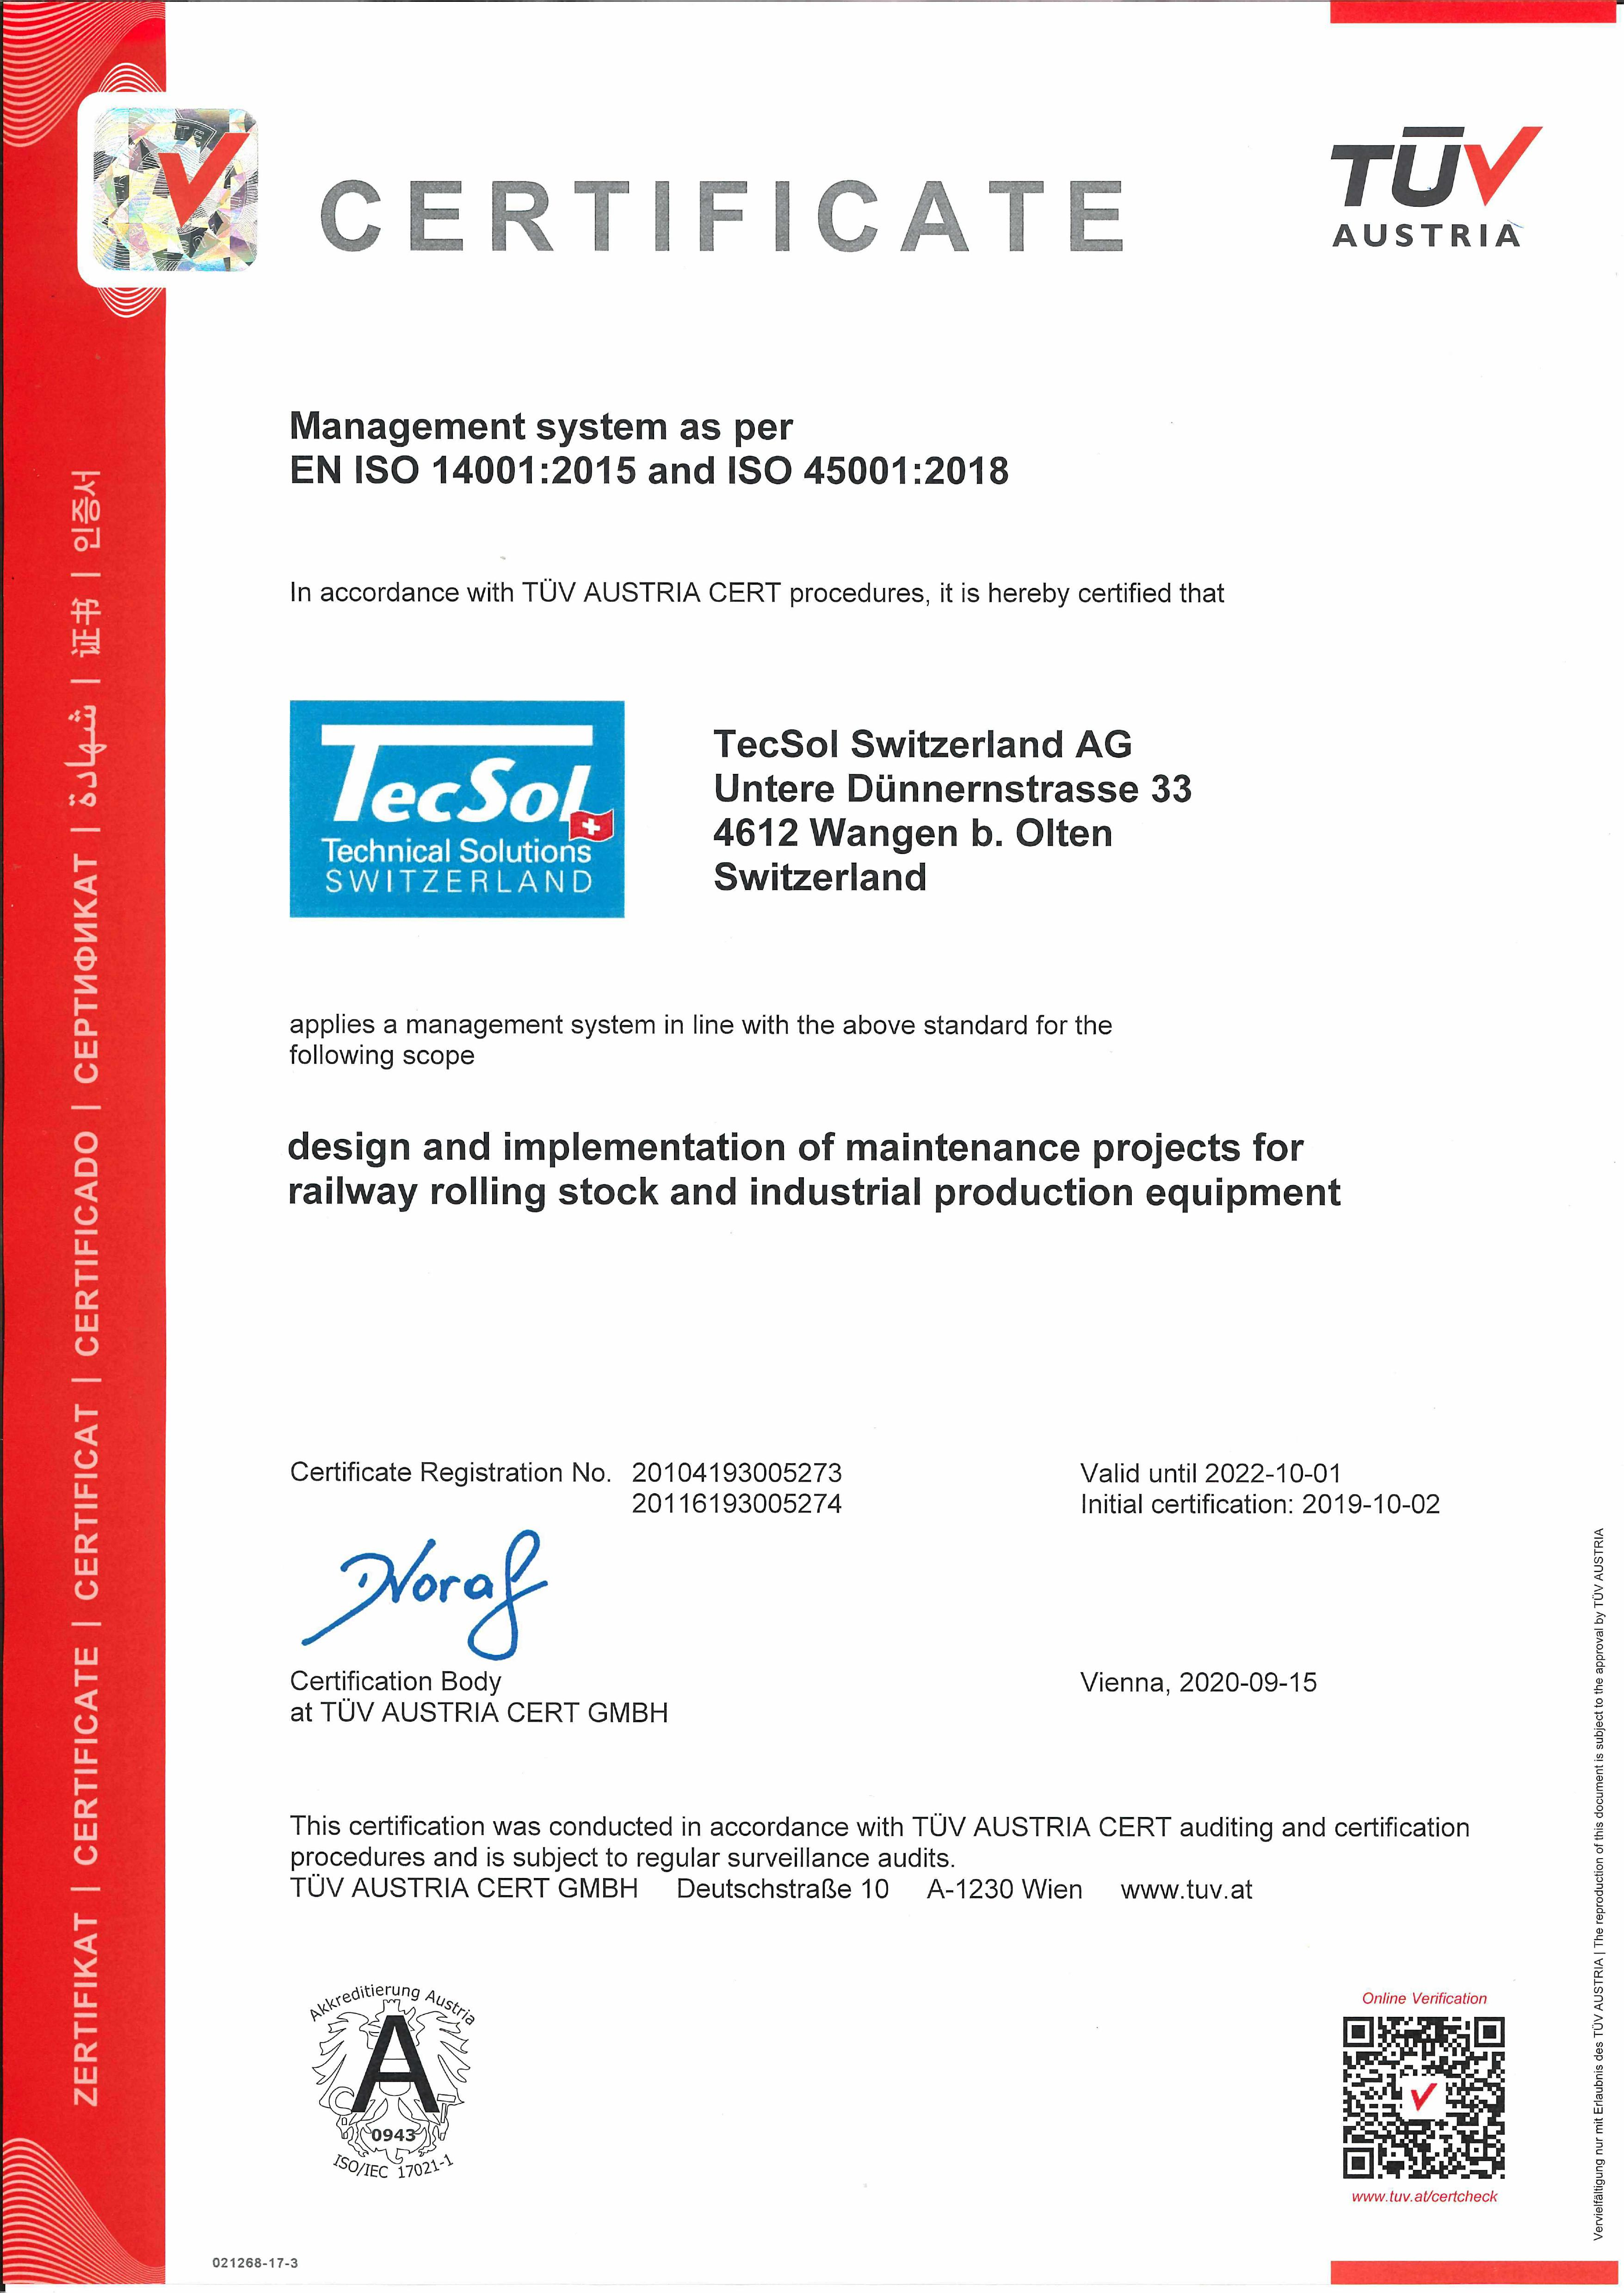 tecsol_eng_20200915_EN ISO 14001_2015 und ISO 45001_2018